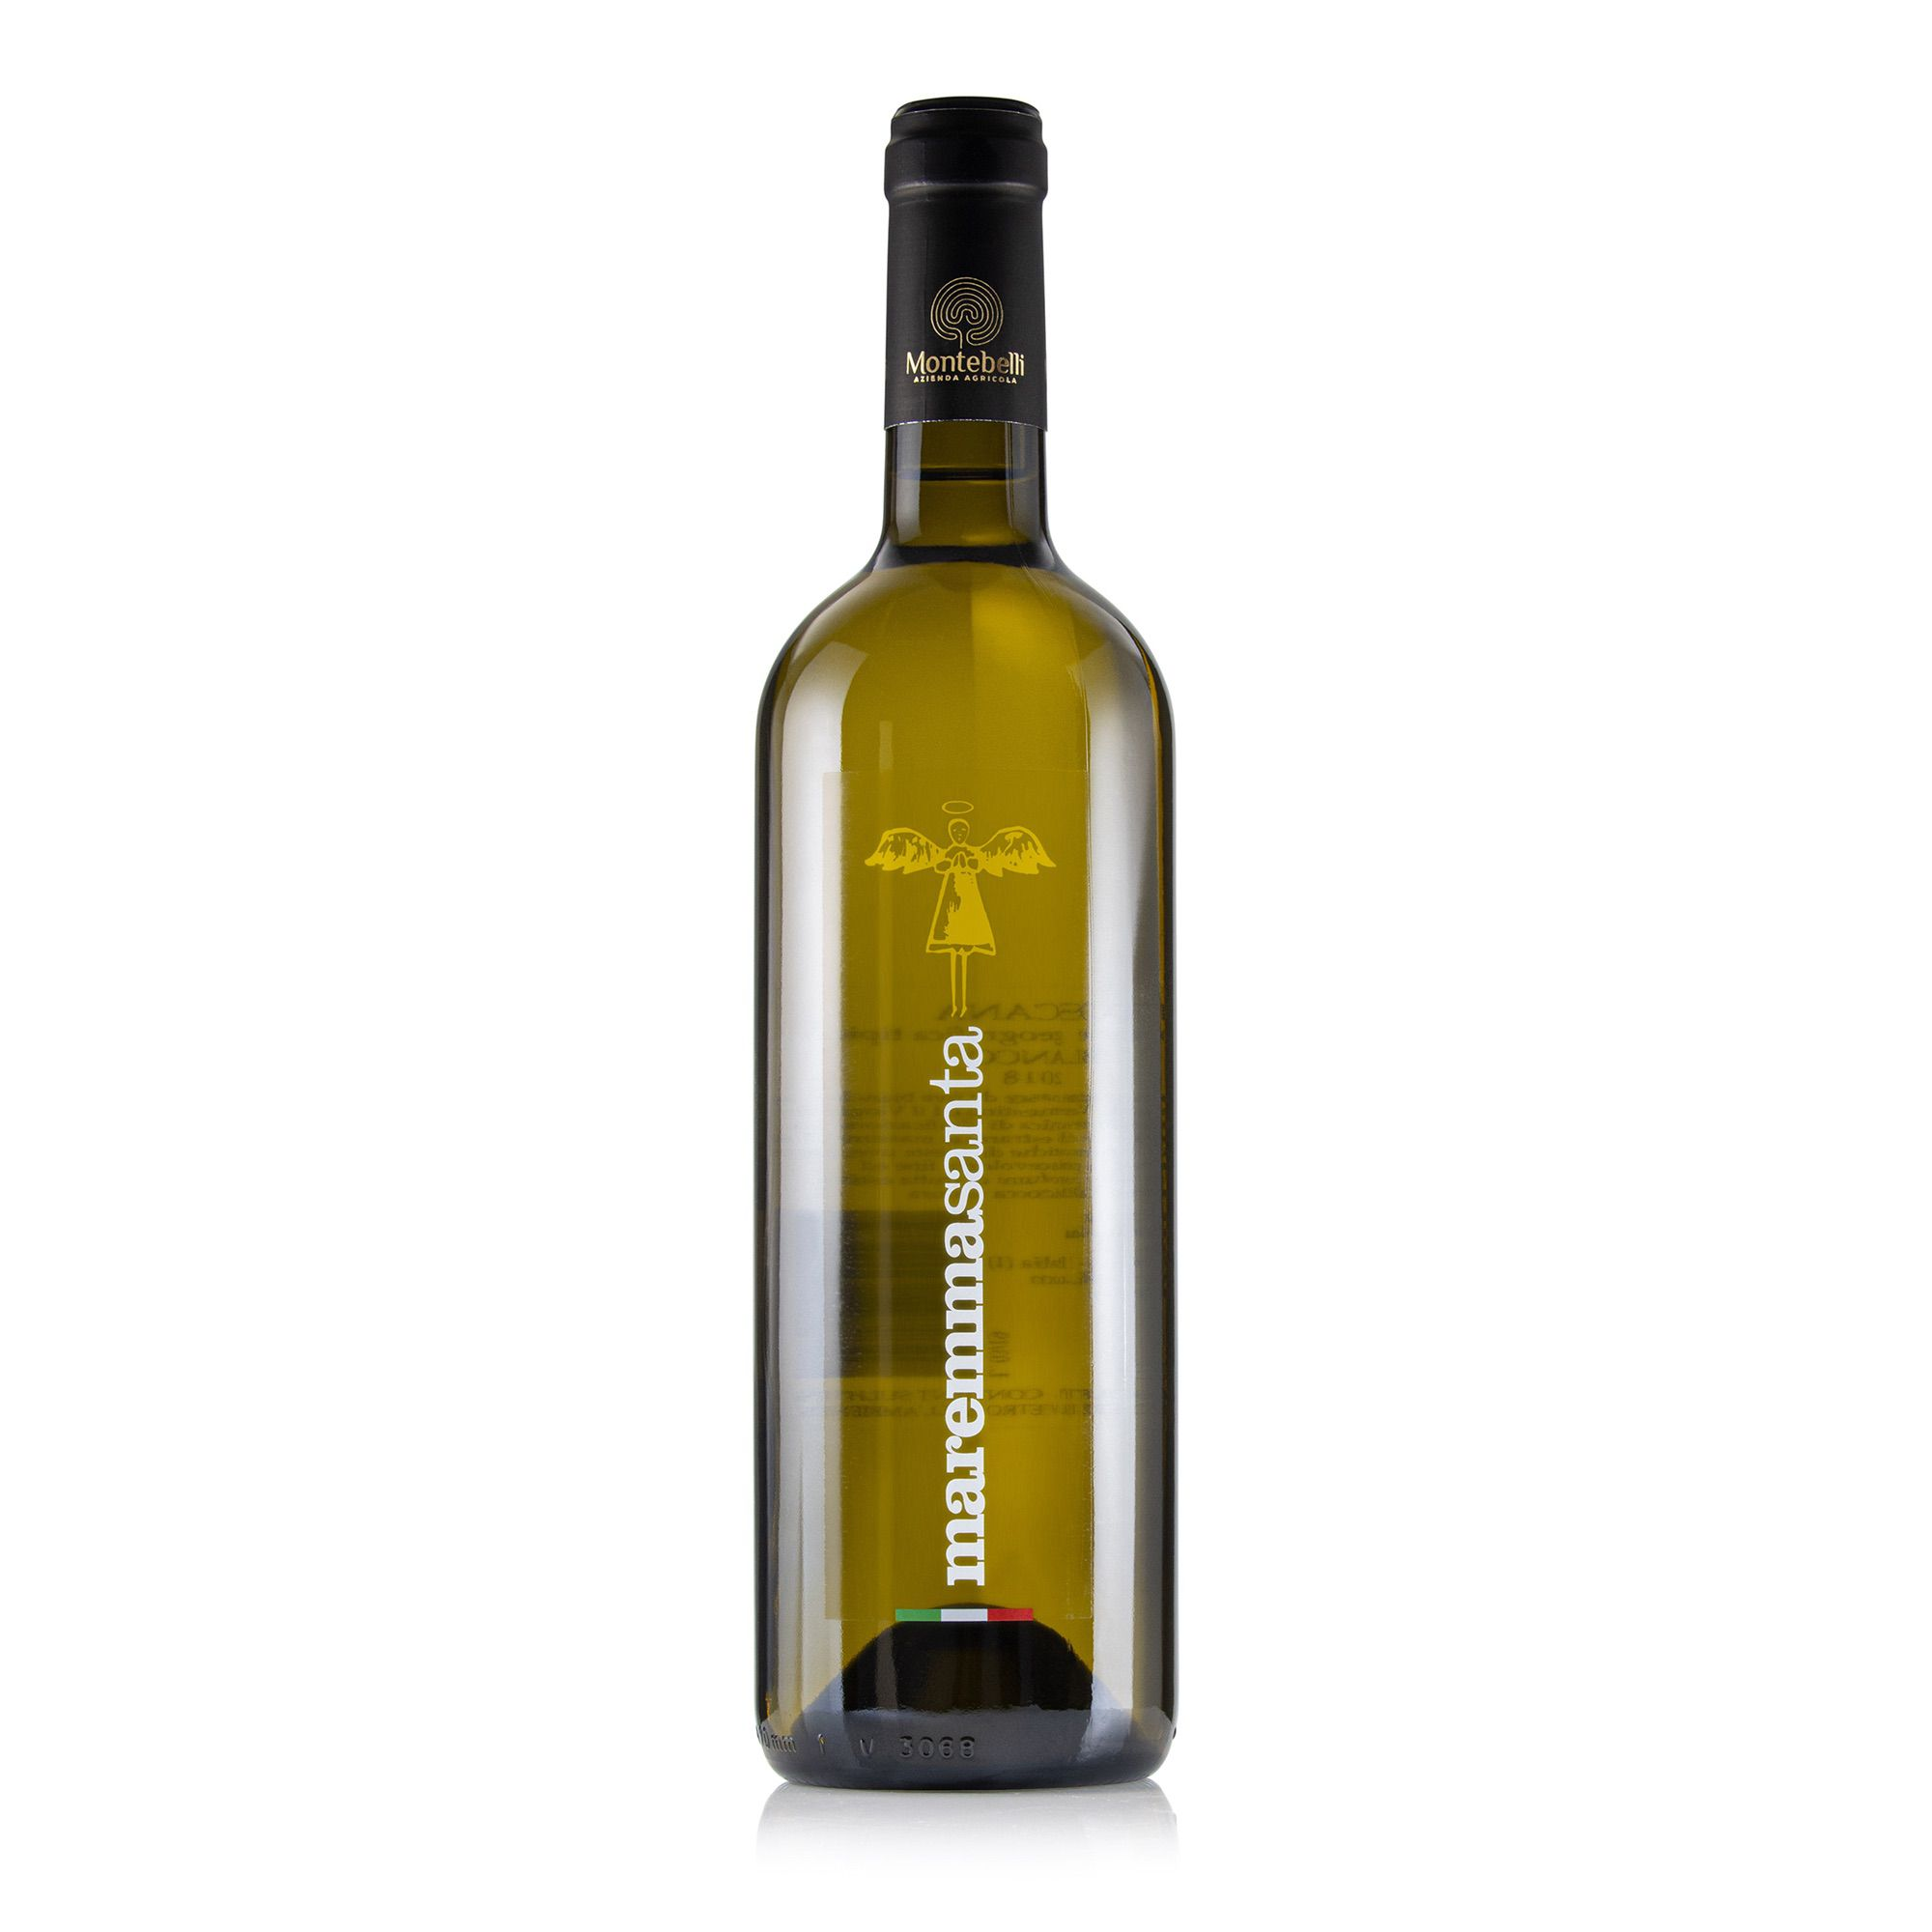 Maremma Santa IGT Tuscany White Wine Montebelli organic farmhouse